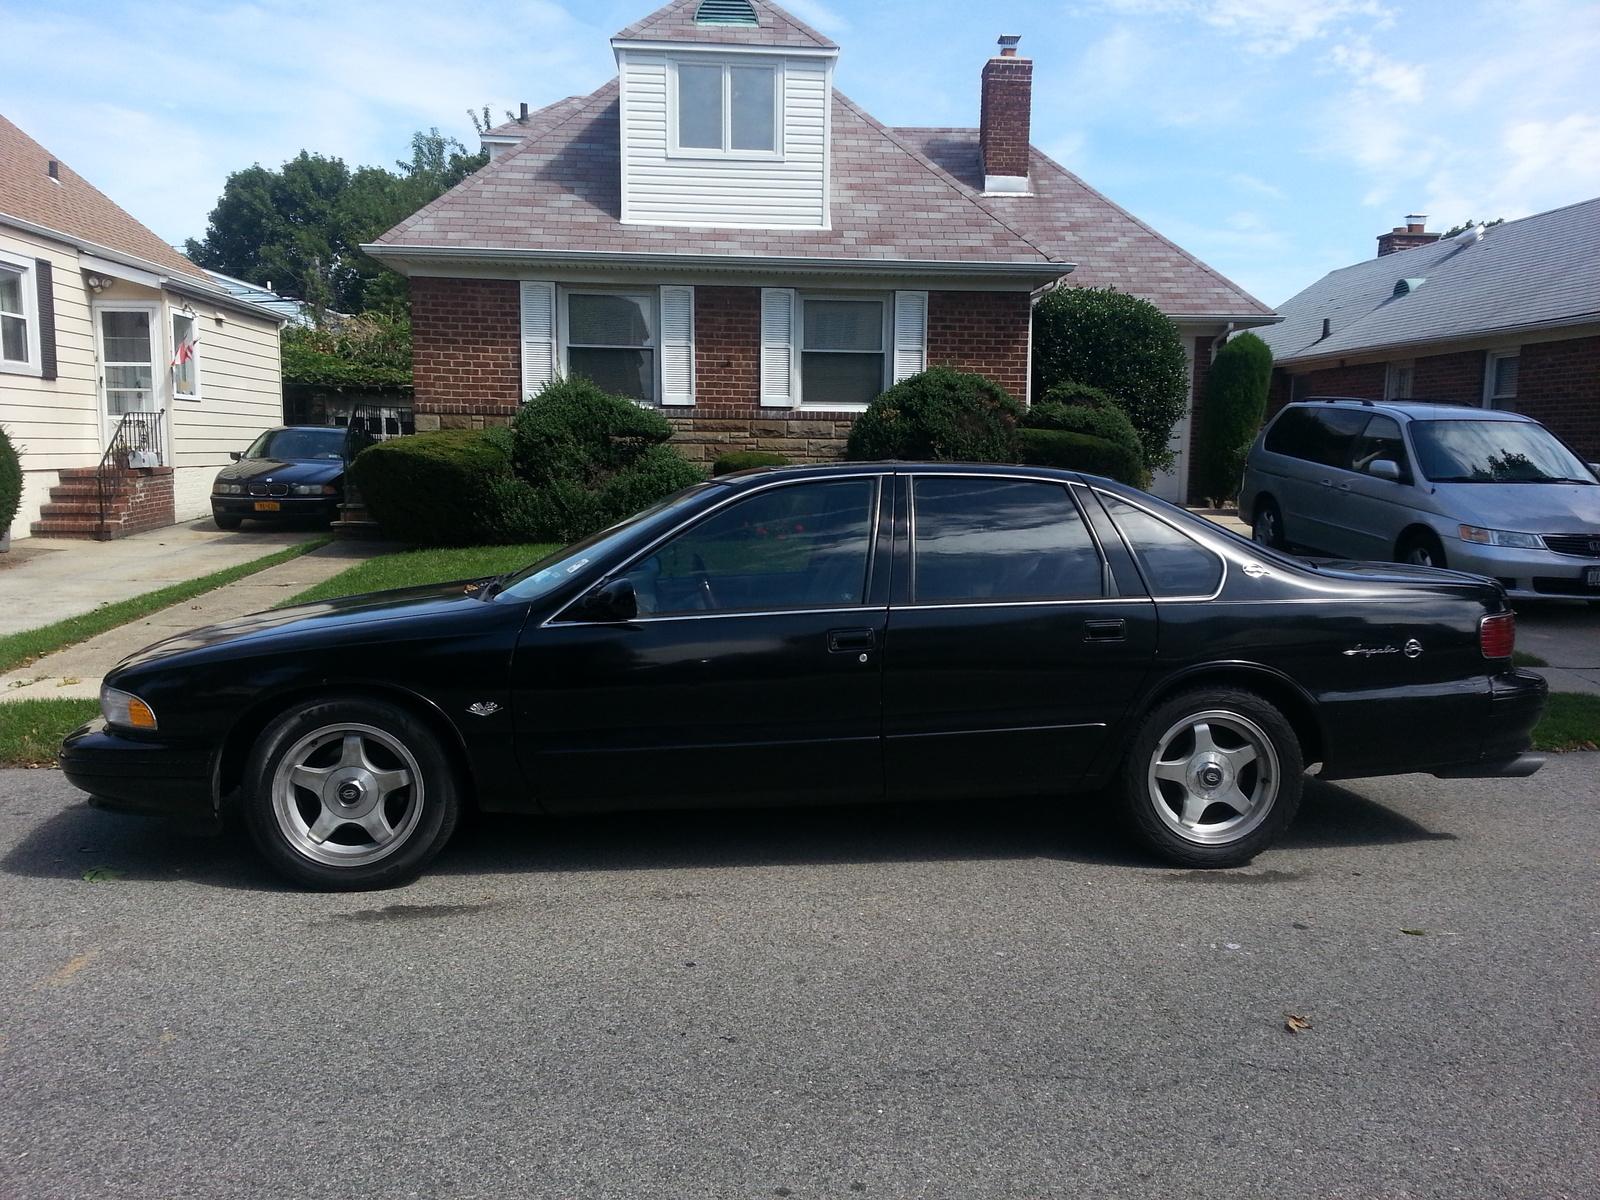 2008 Chevy Camaro Price 1995 Chevrolet Impala - Pictures - CarGurus